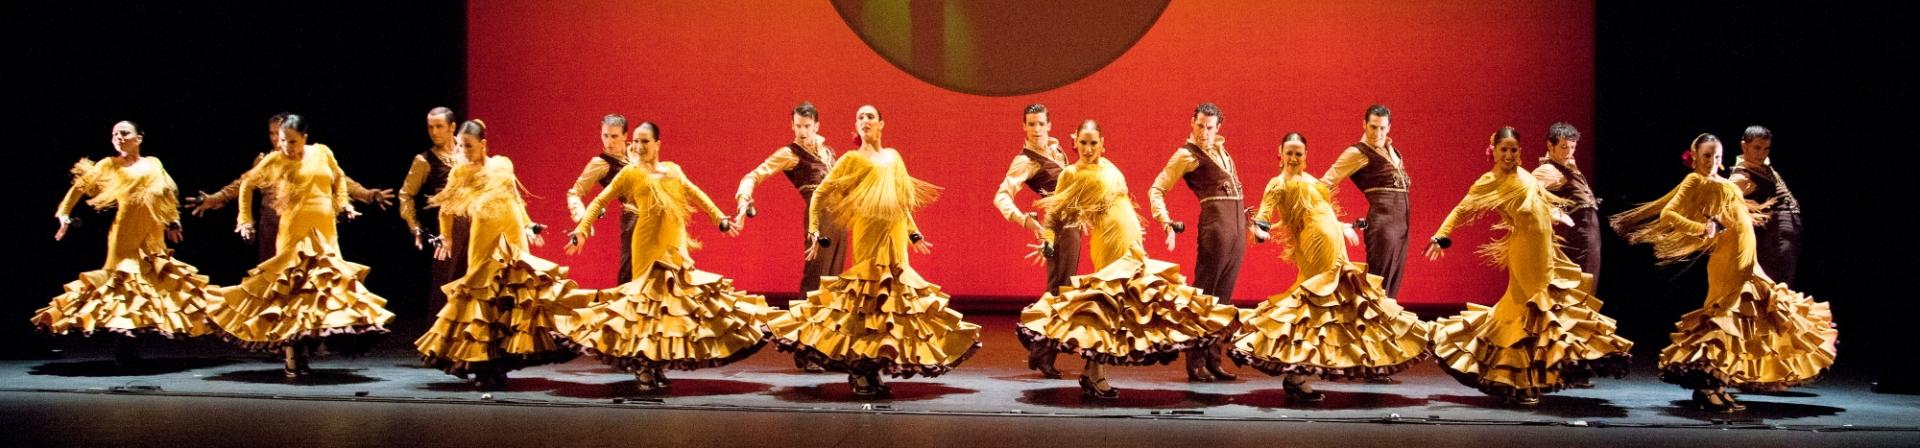 carrusel-flamenco1